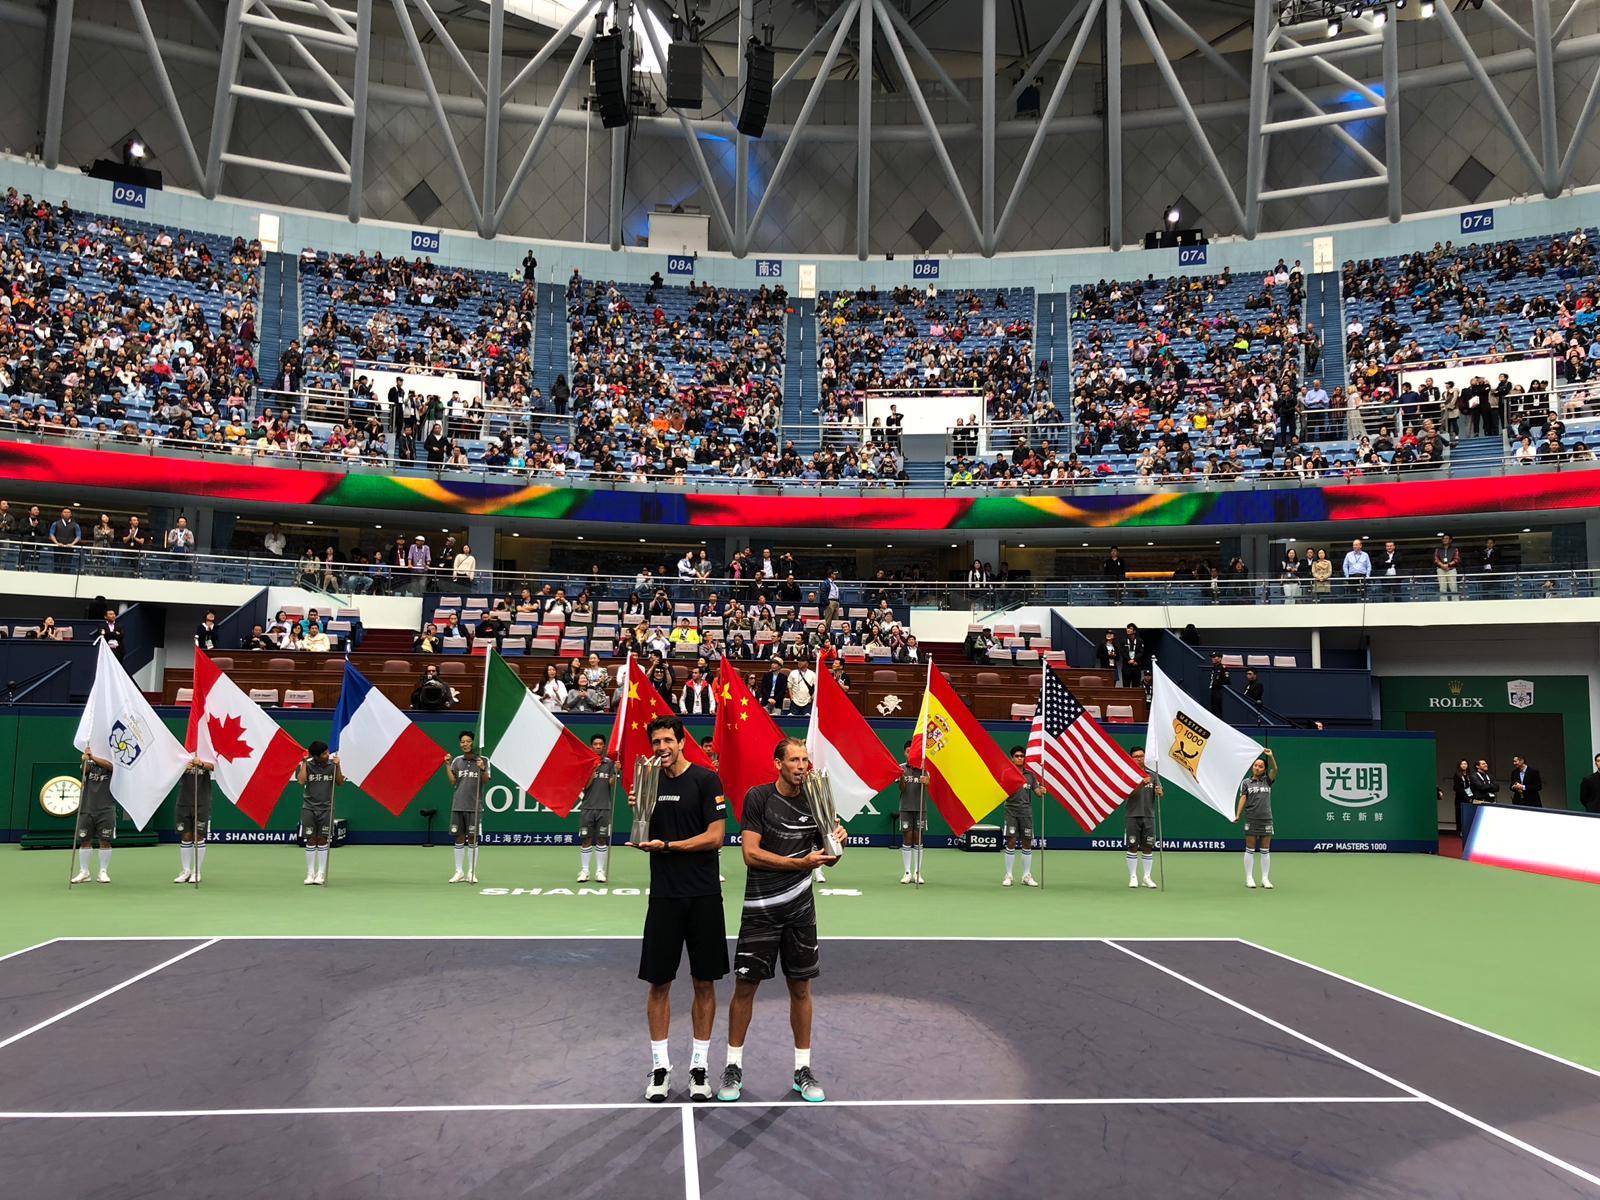 Em Indian Wells, Marcelo Melo faz 14ª final e busca 10º título de Masters 1000